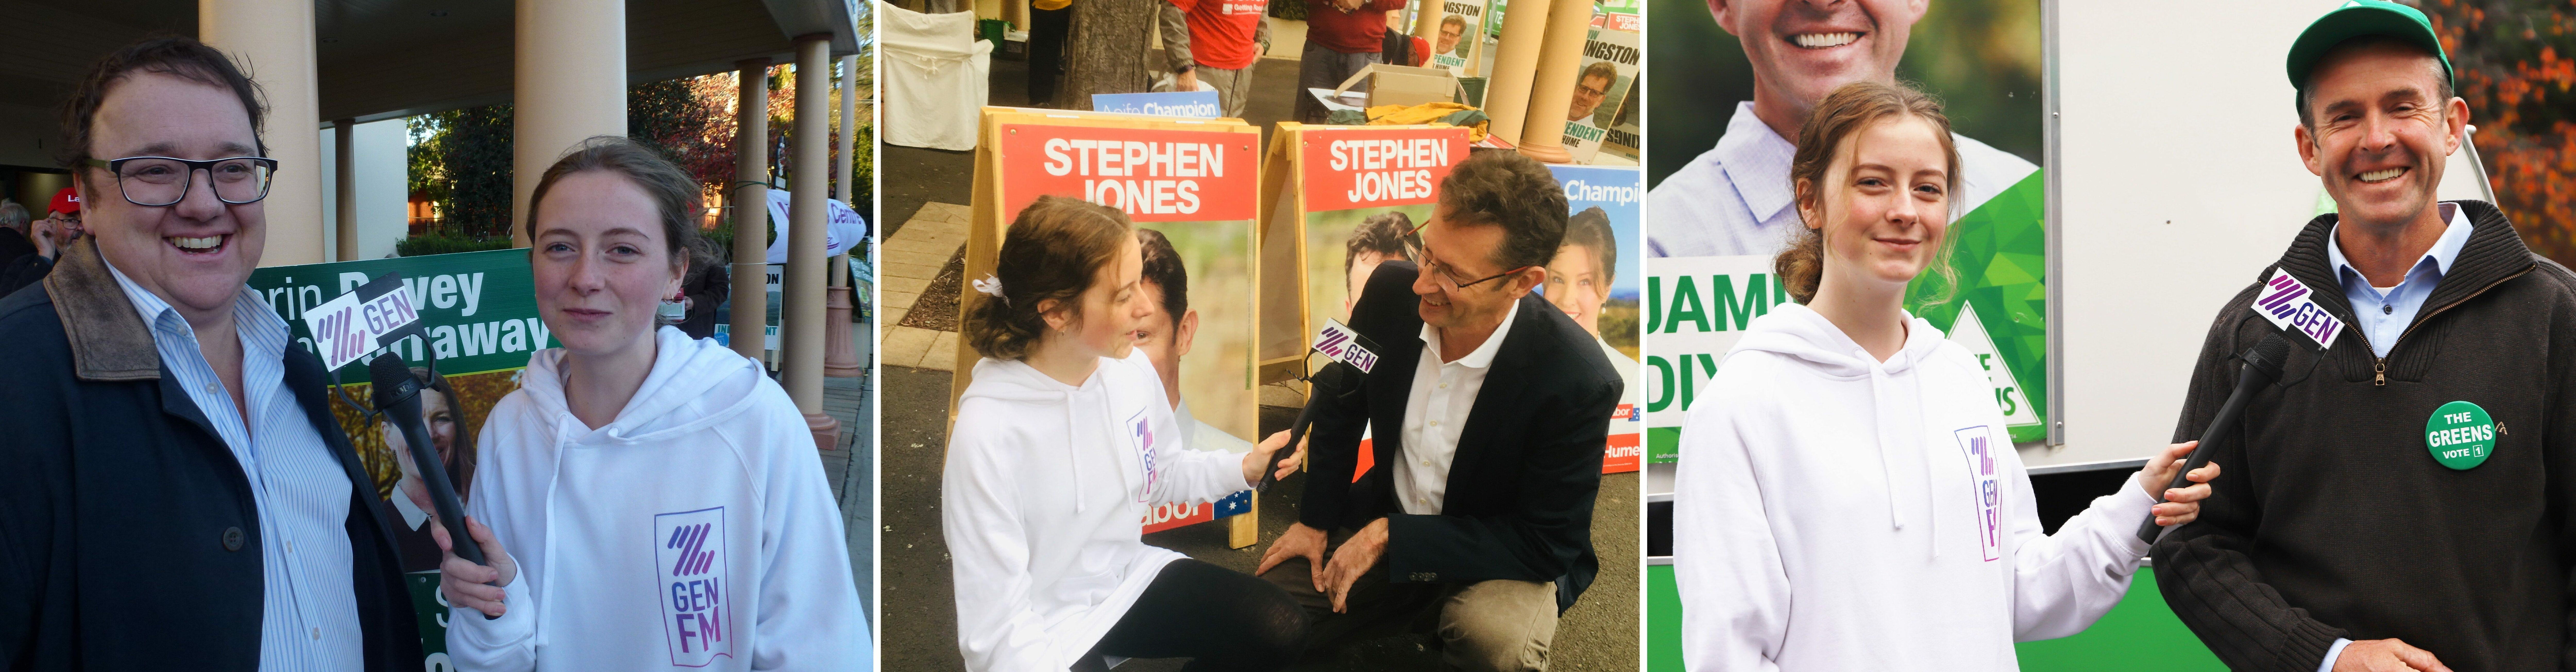 Election candidates Whitlam